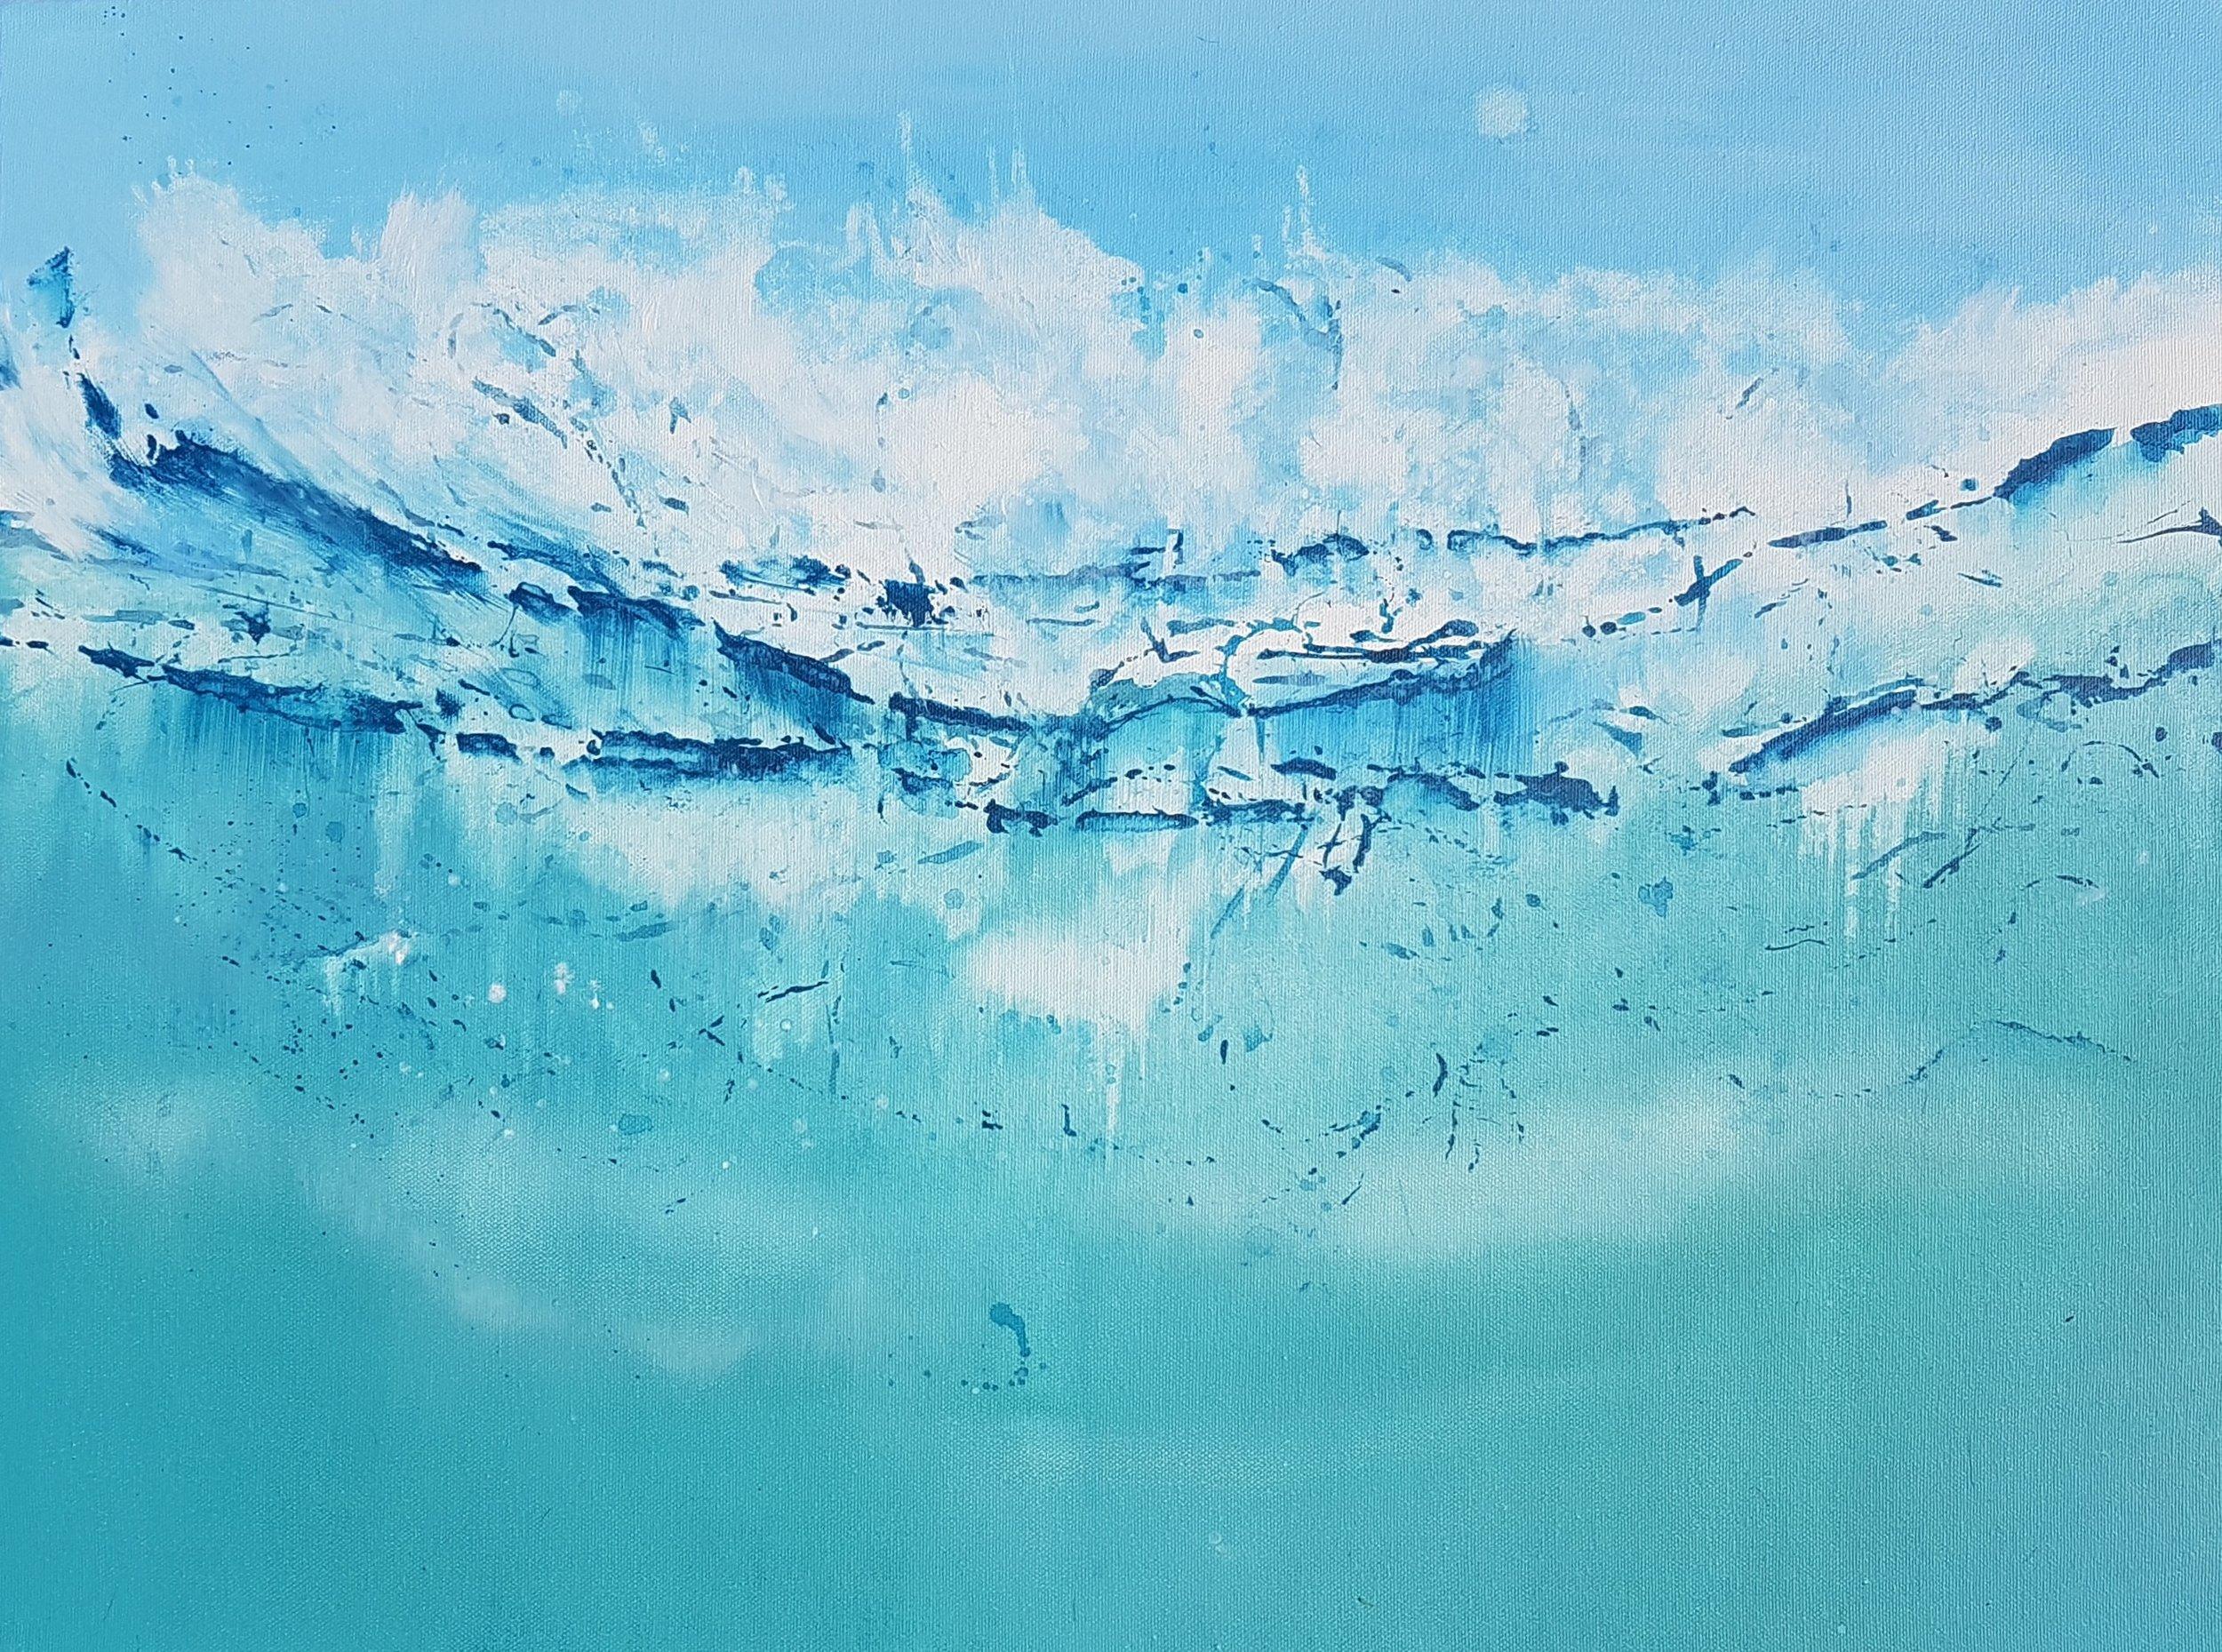 White Water Chaos In Porthtowan SOLD